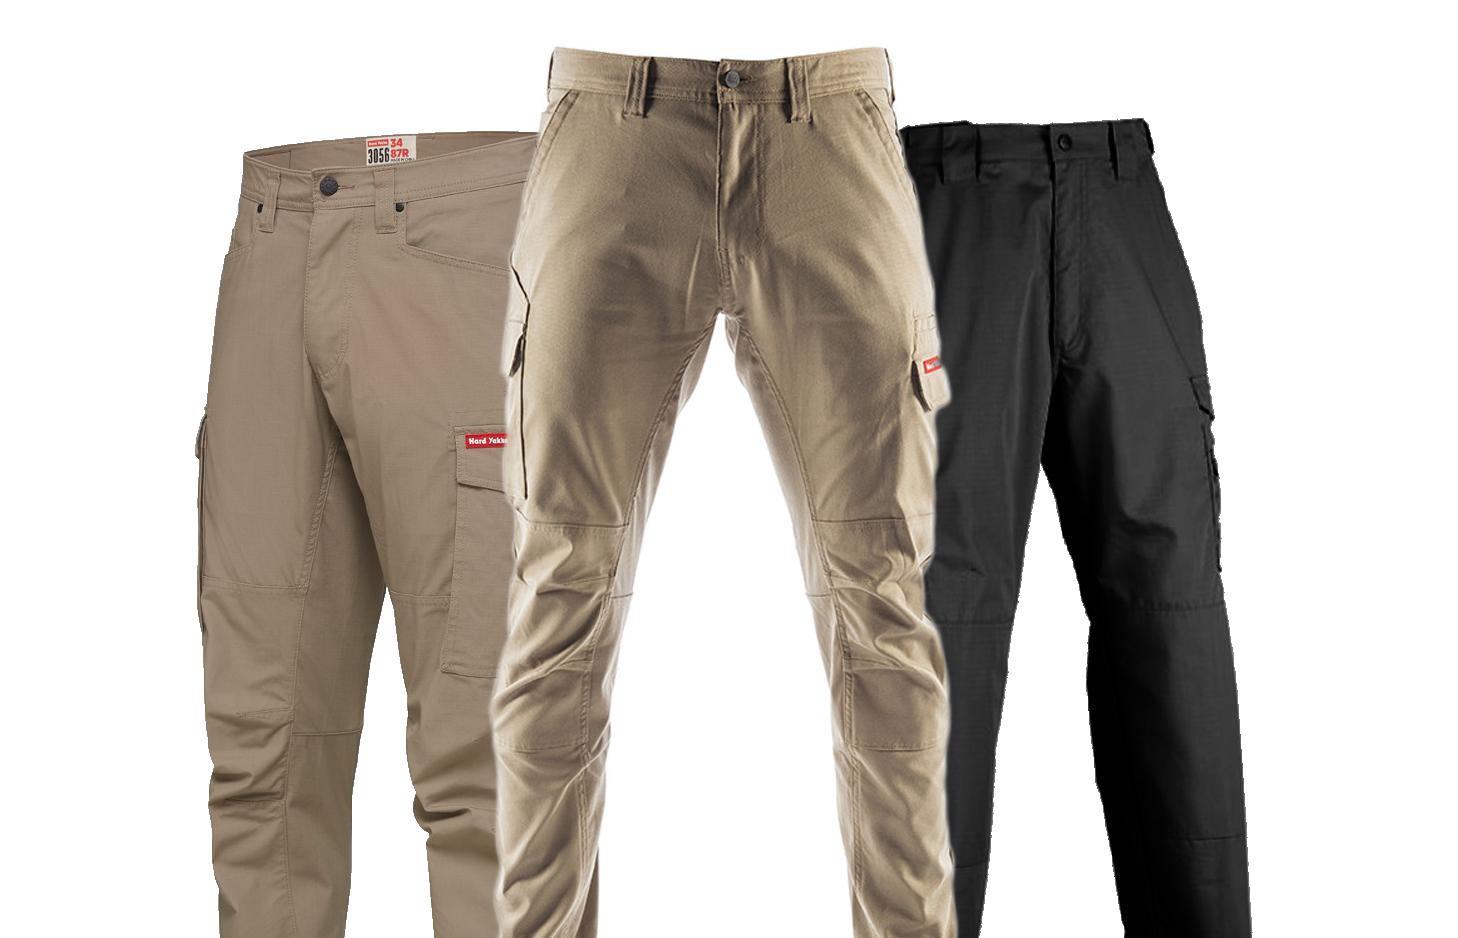 dress tactical pants at bereli